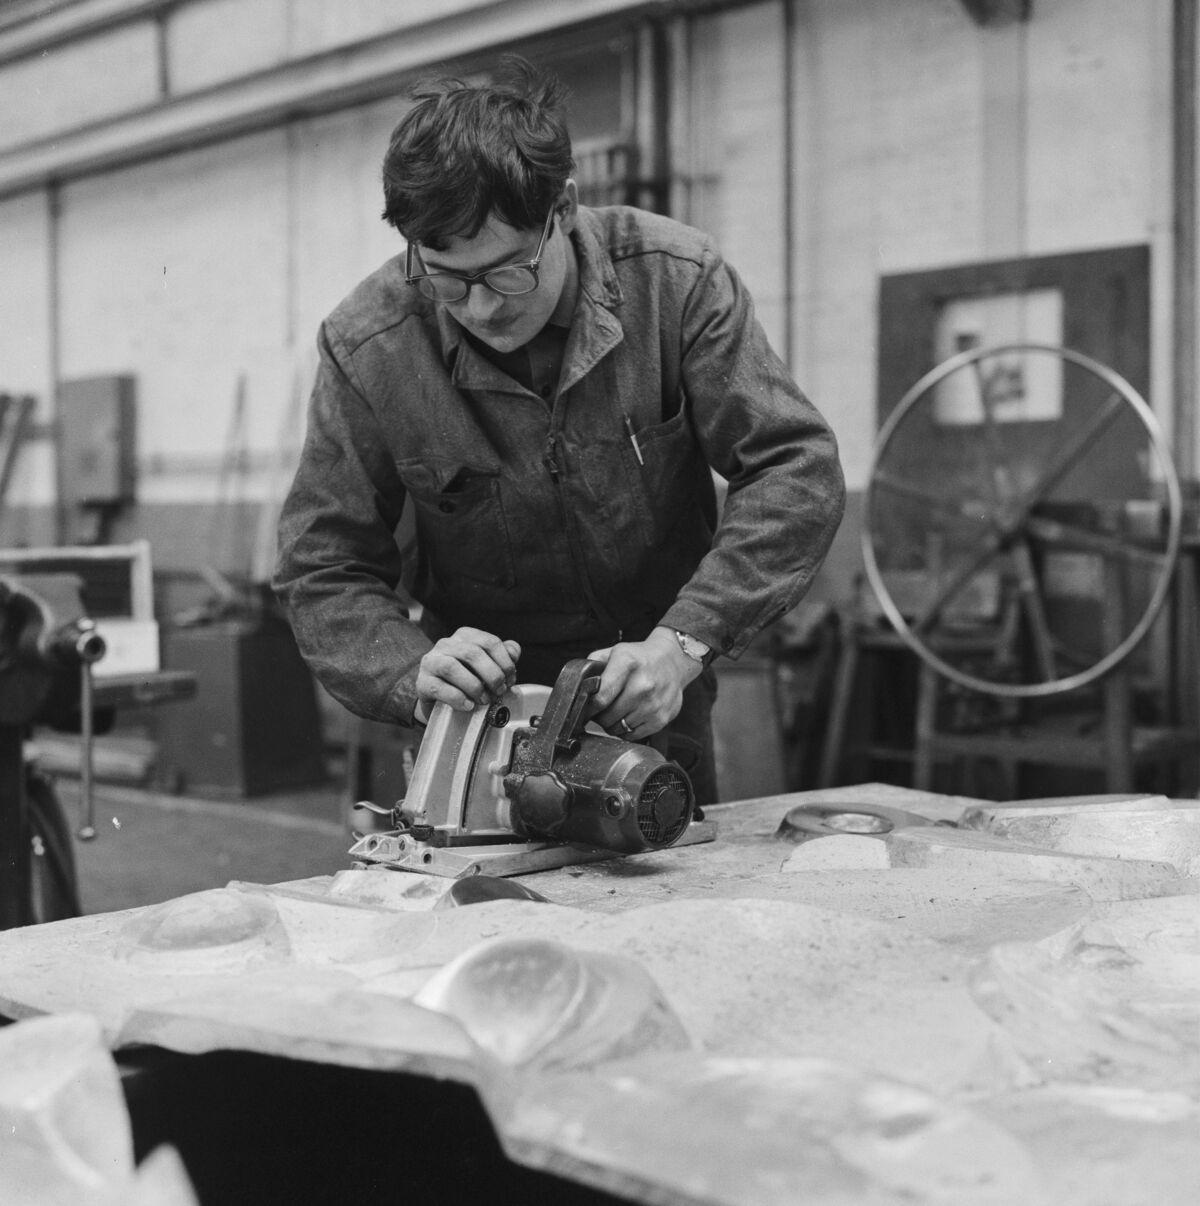 GFA 17/690438.2: Reportage: Manufacture of an aluminium sculpture